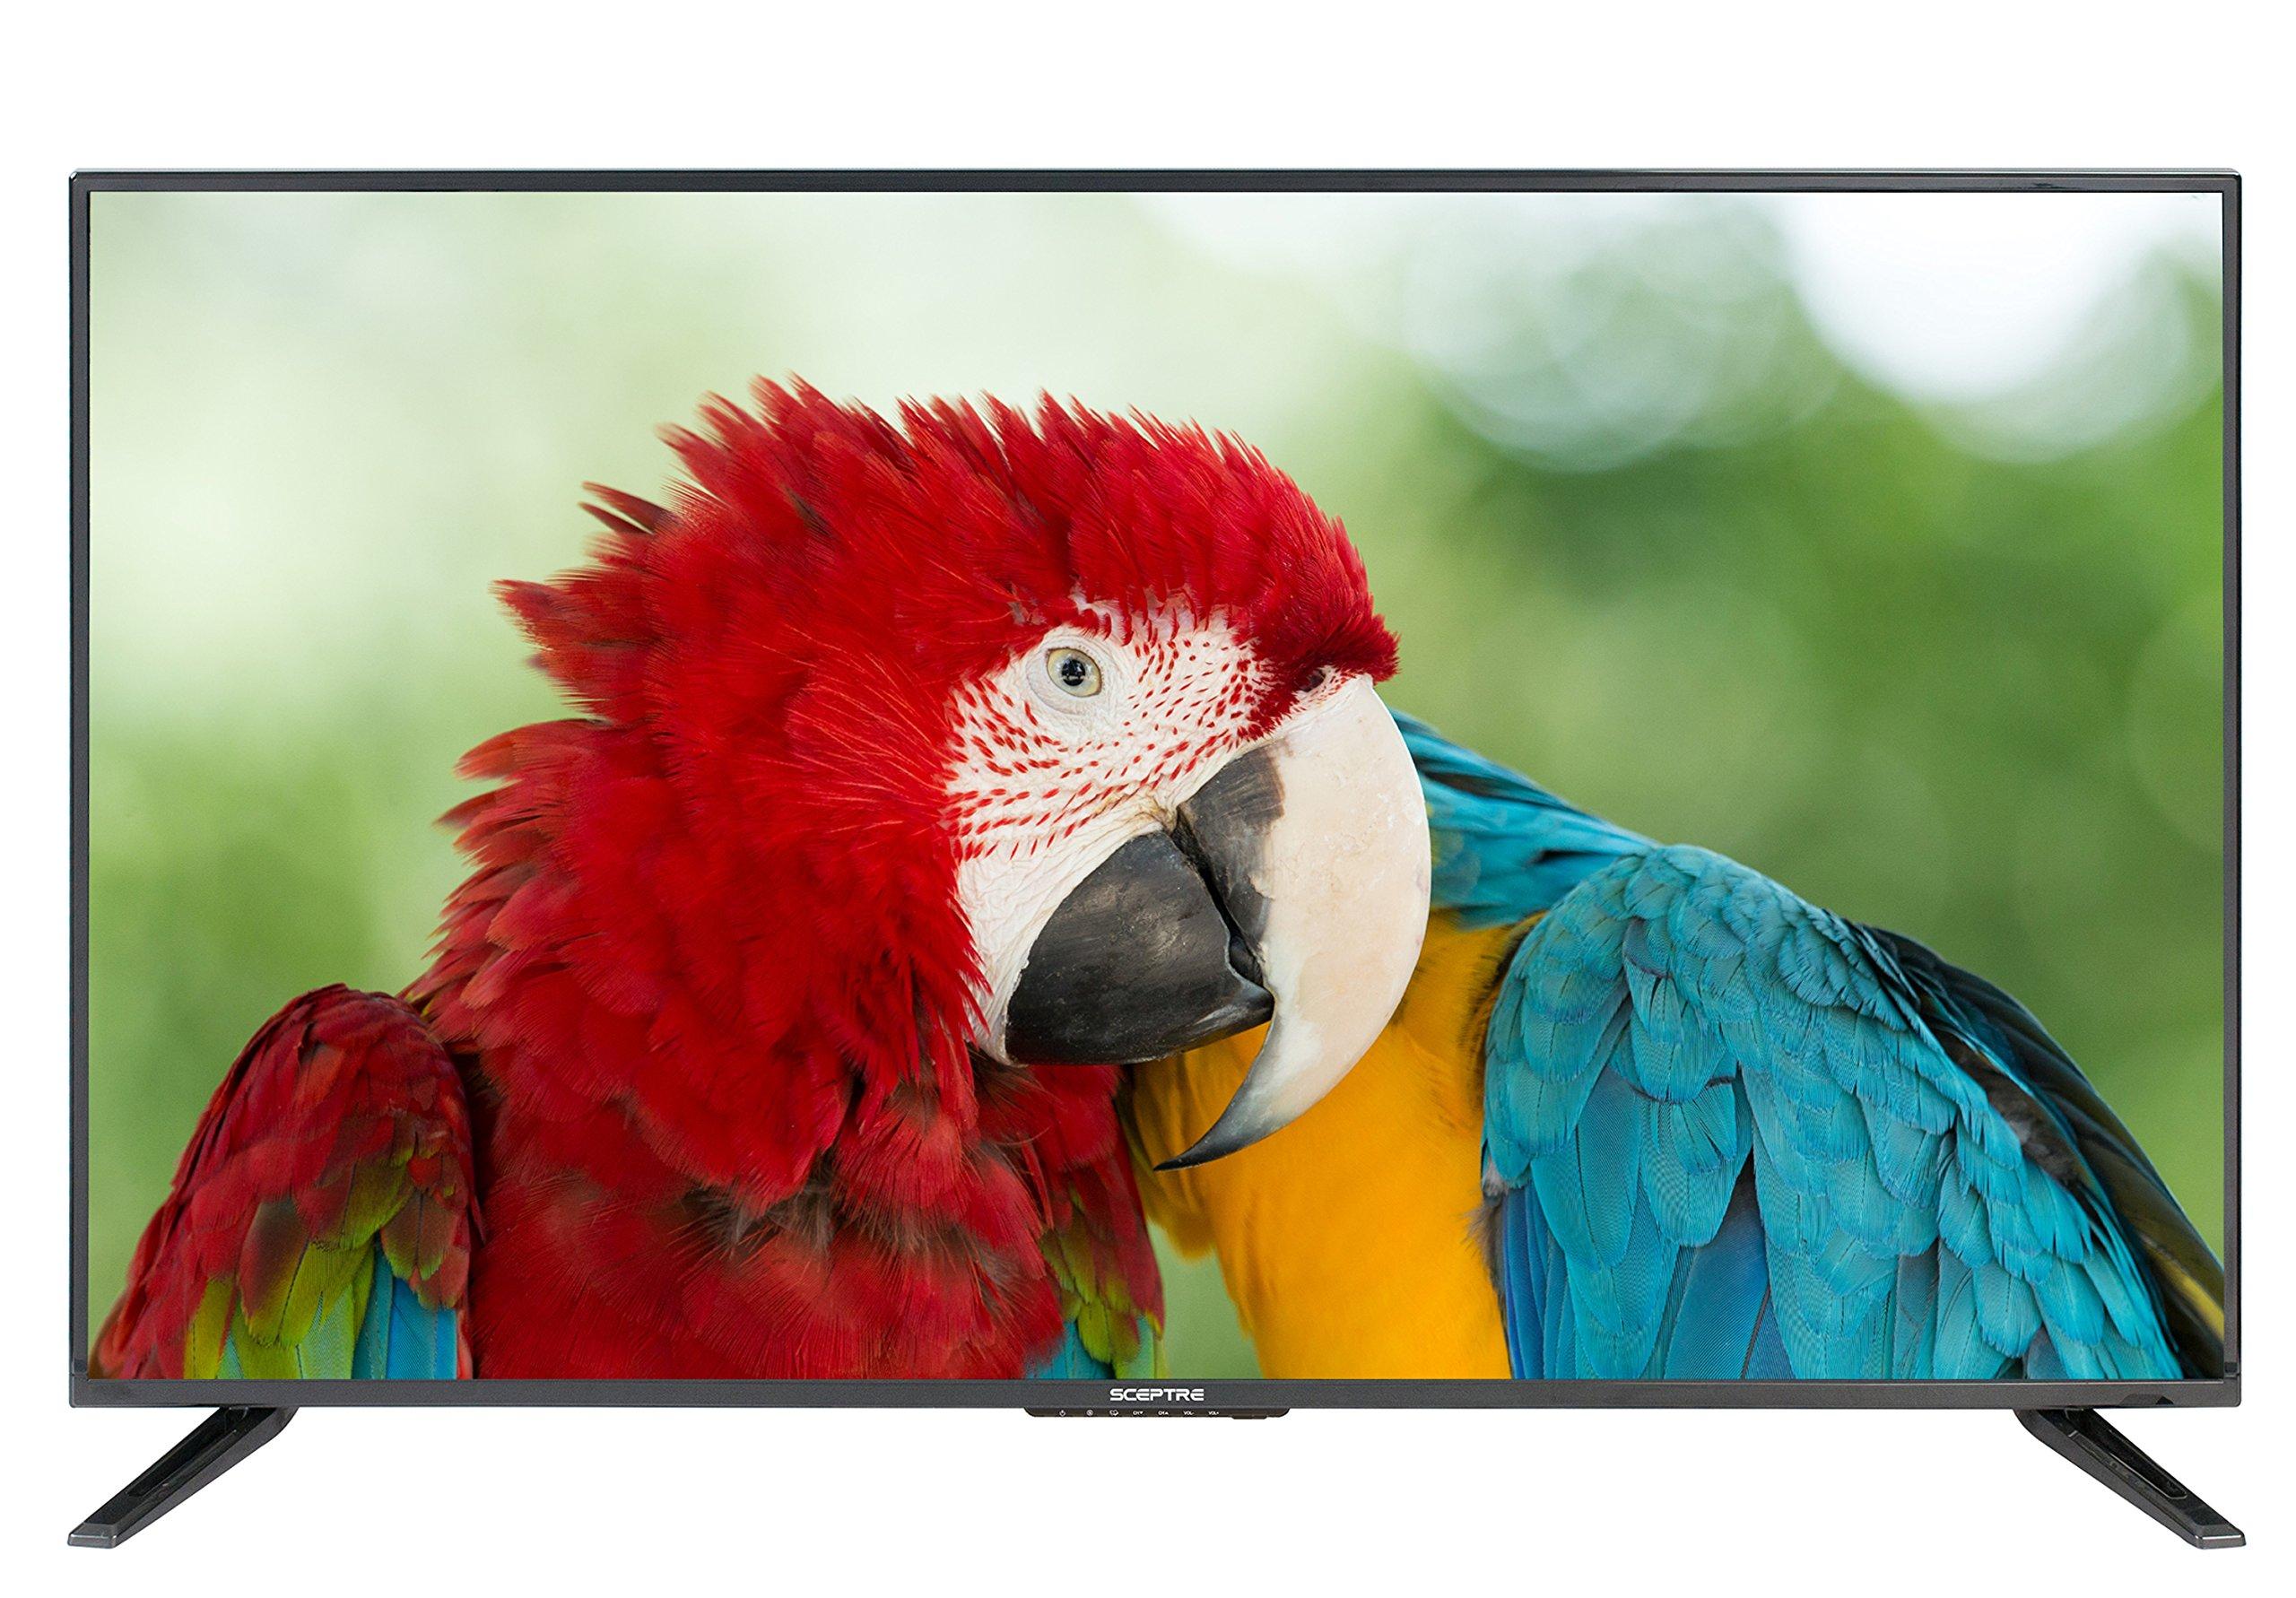 "Komodo by Sceptre 43"" LED HDTV 3X HDMI 2.0 HDCP 2.2 VESA Wall Mount Ready, Metal Black 2018"